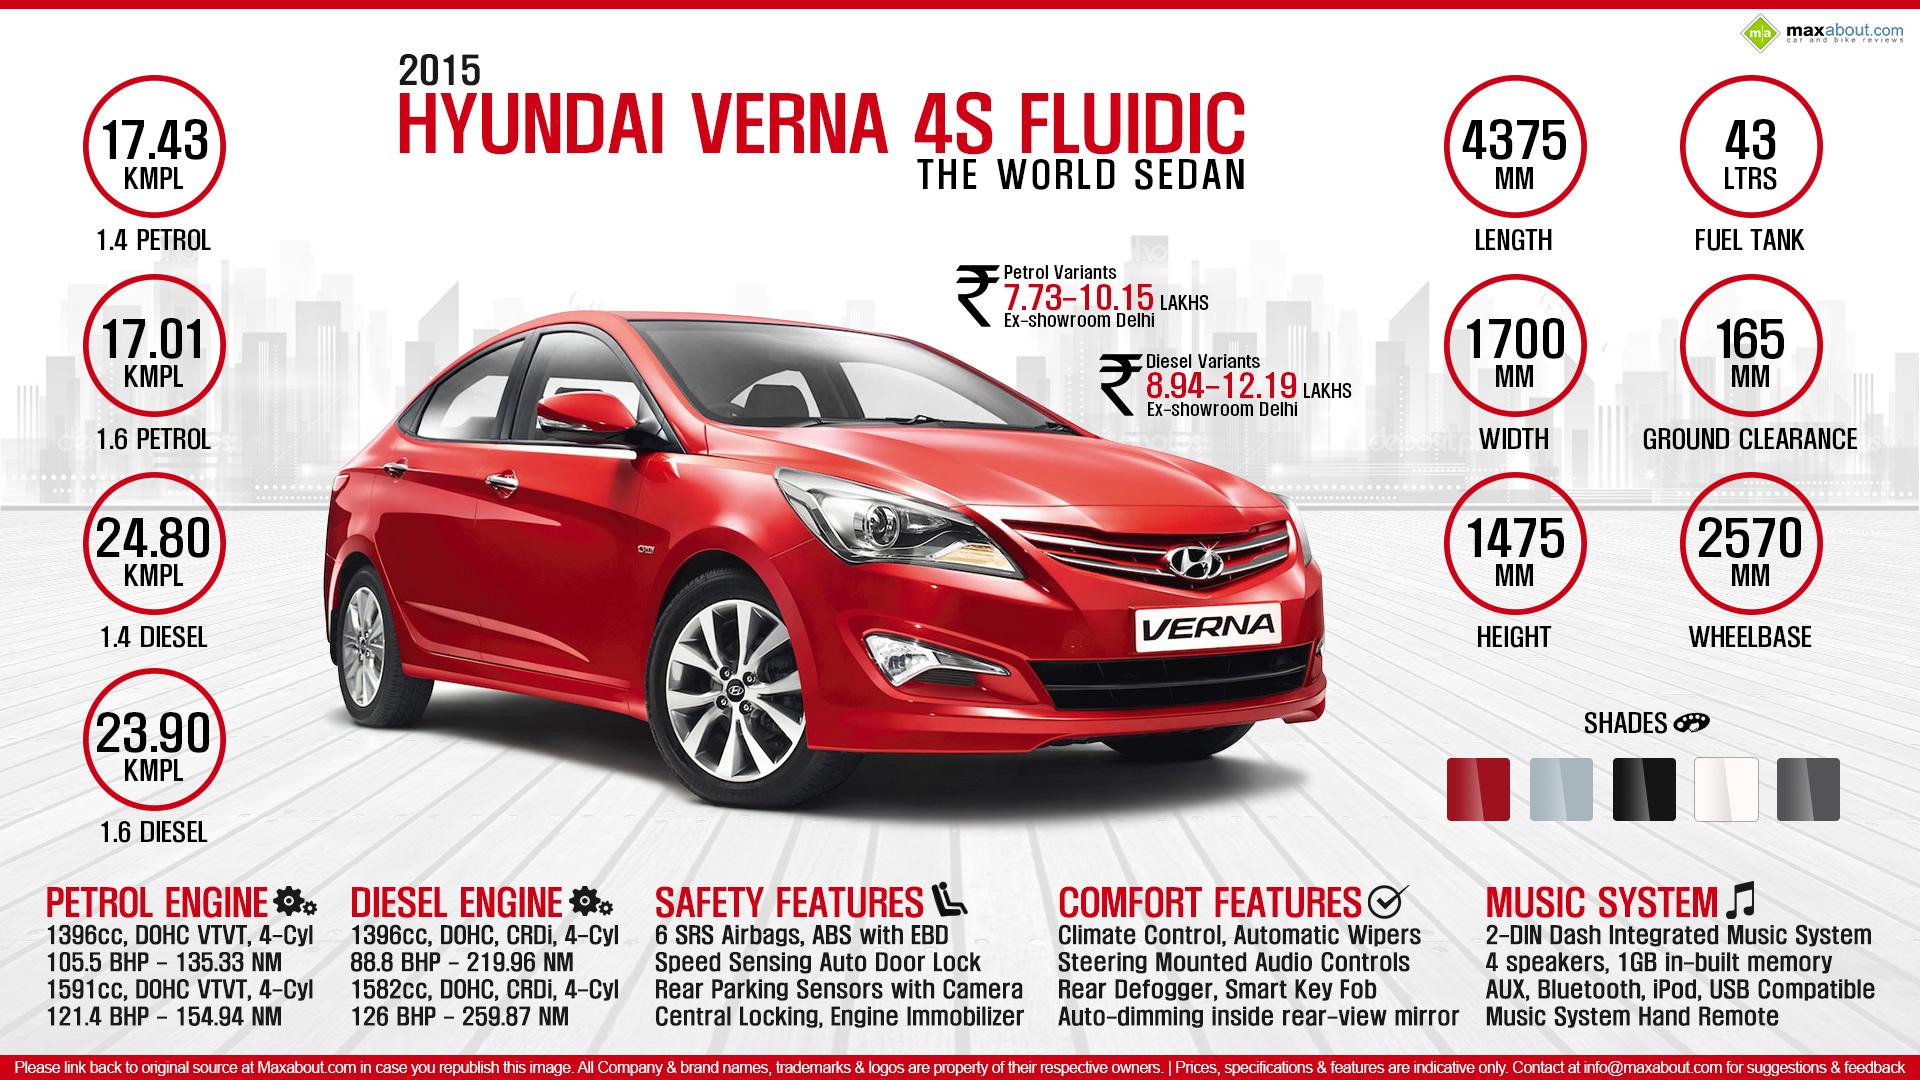 2015 Hyundai Verna 4S Fluidic   The World Sedan 1920x1080